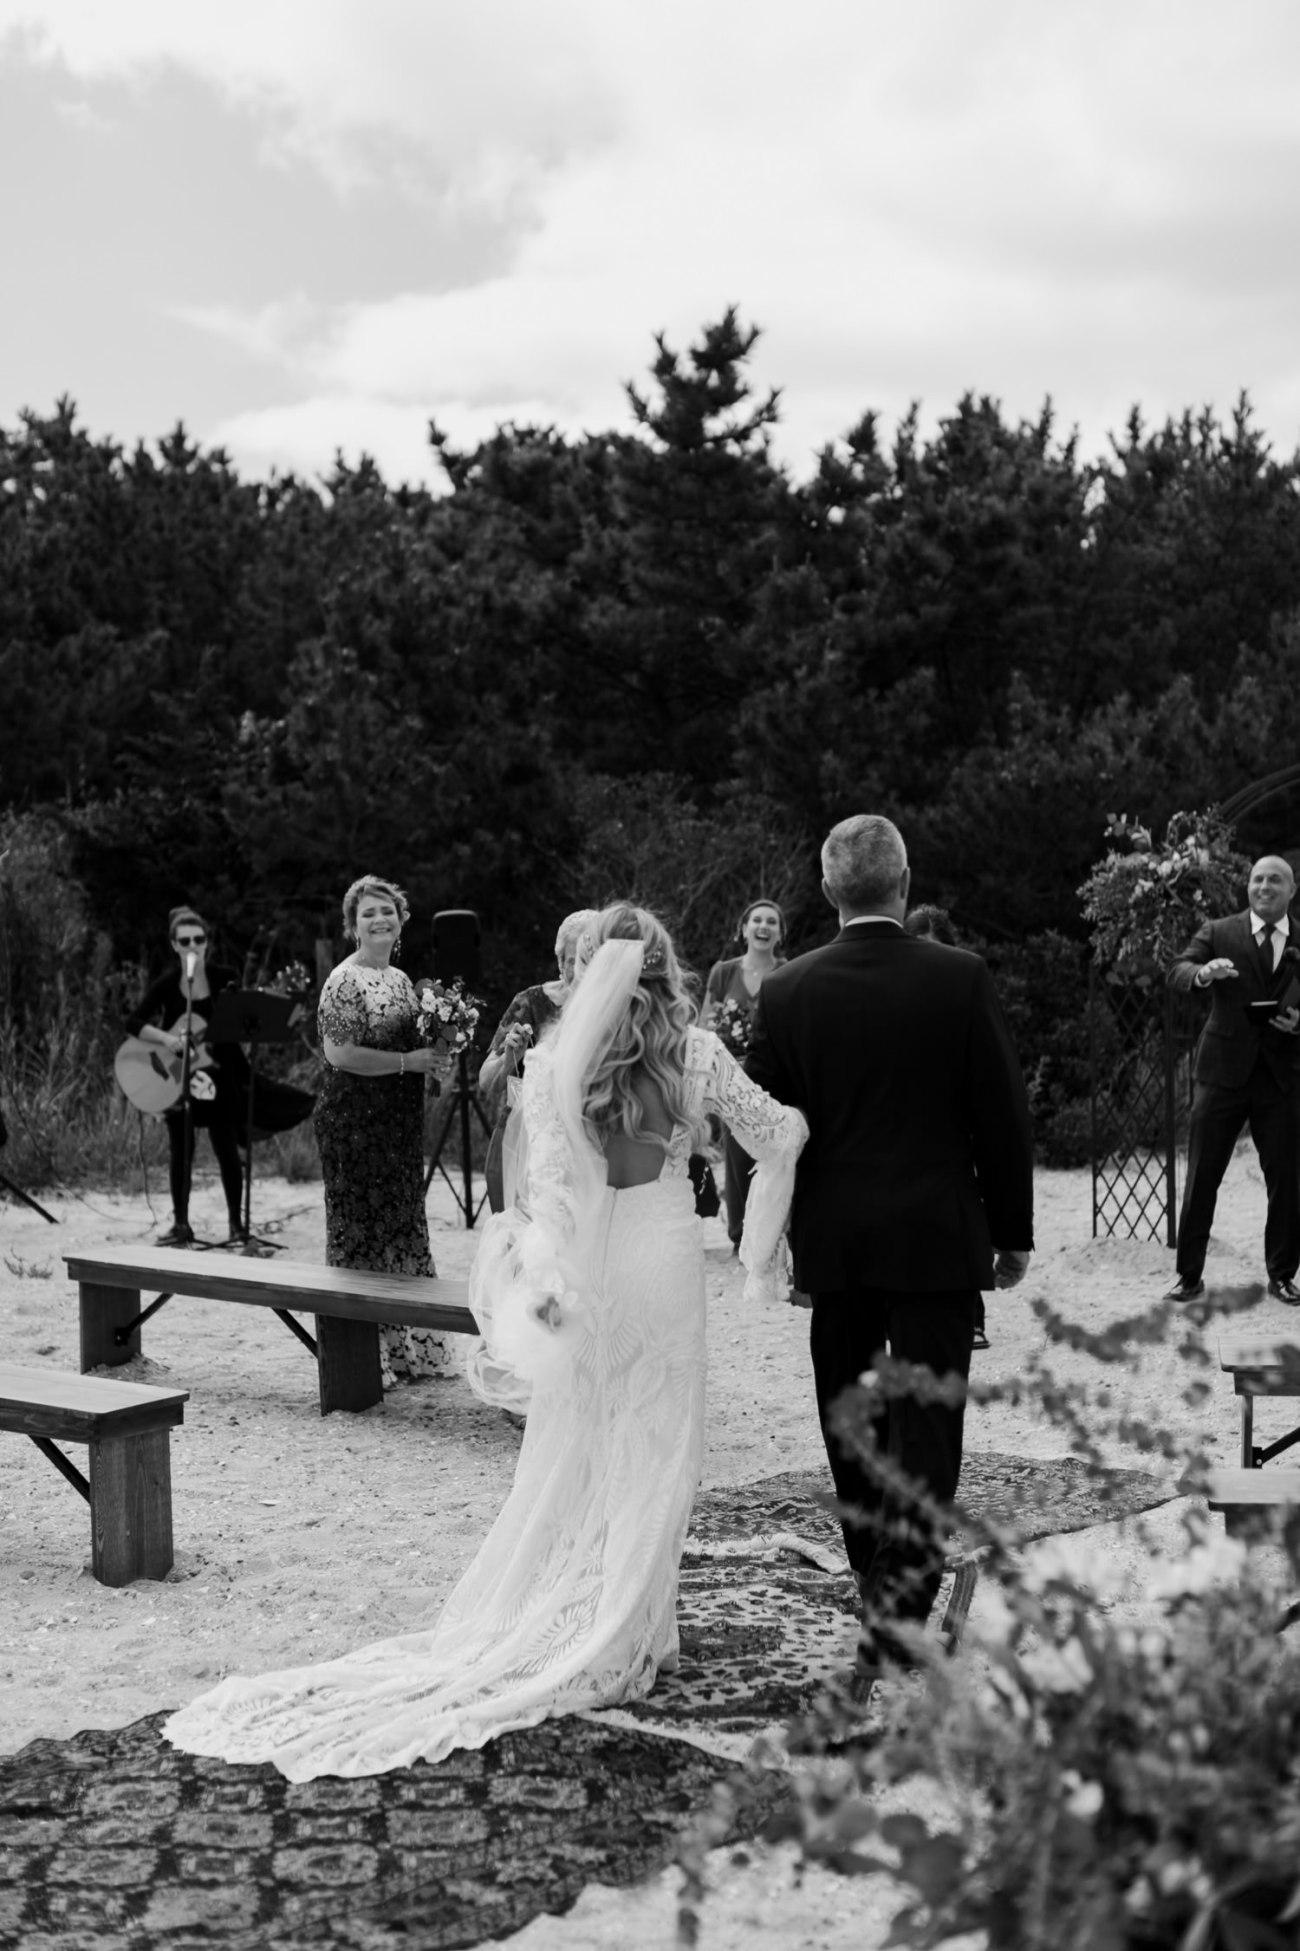 Long Beach Island Wedding Barnegat Lighthouse Wedding Ceremony New Jersey Wedding Anais Possamai Photography Oregon Wedding Photographer 0029